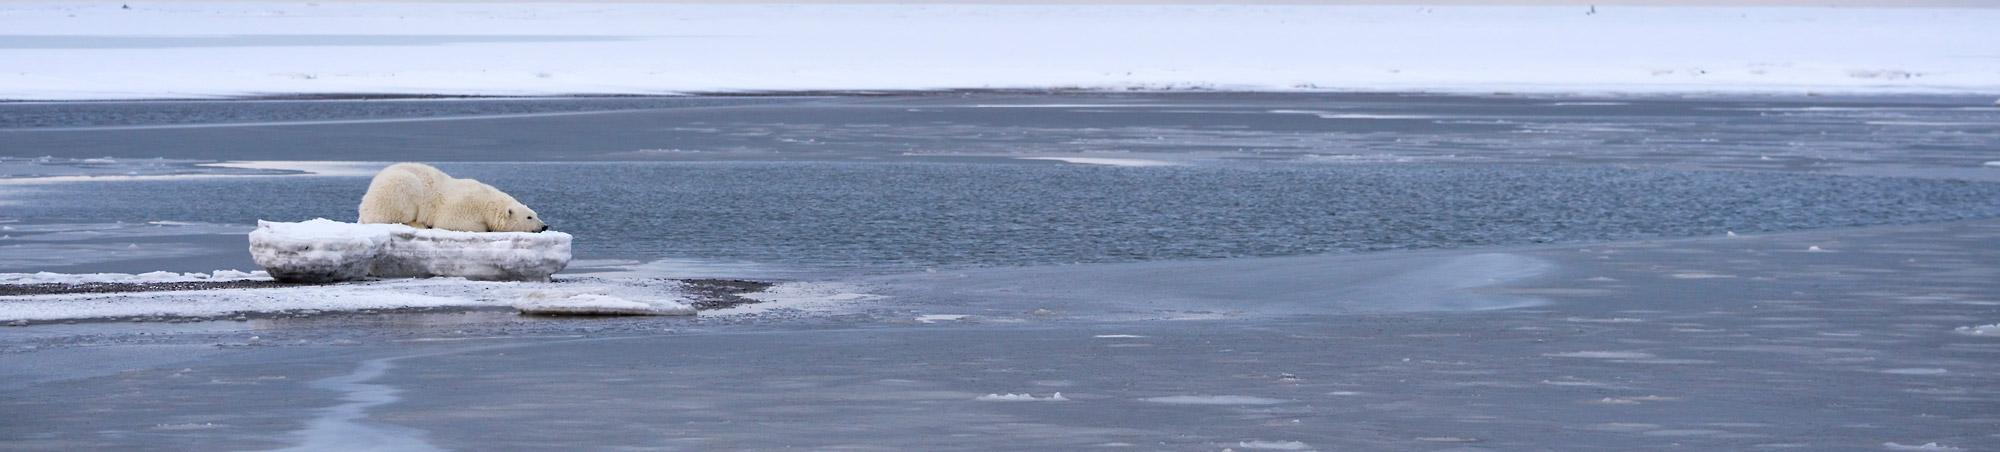 Polar bear resting on ice, ANWR, Alaska.